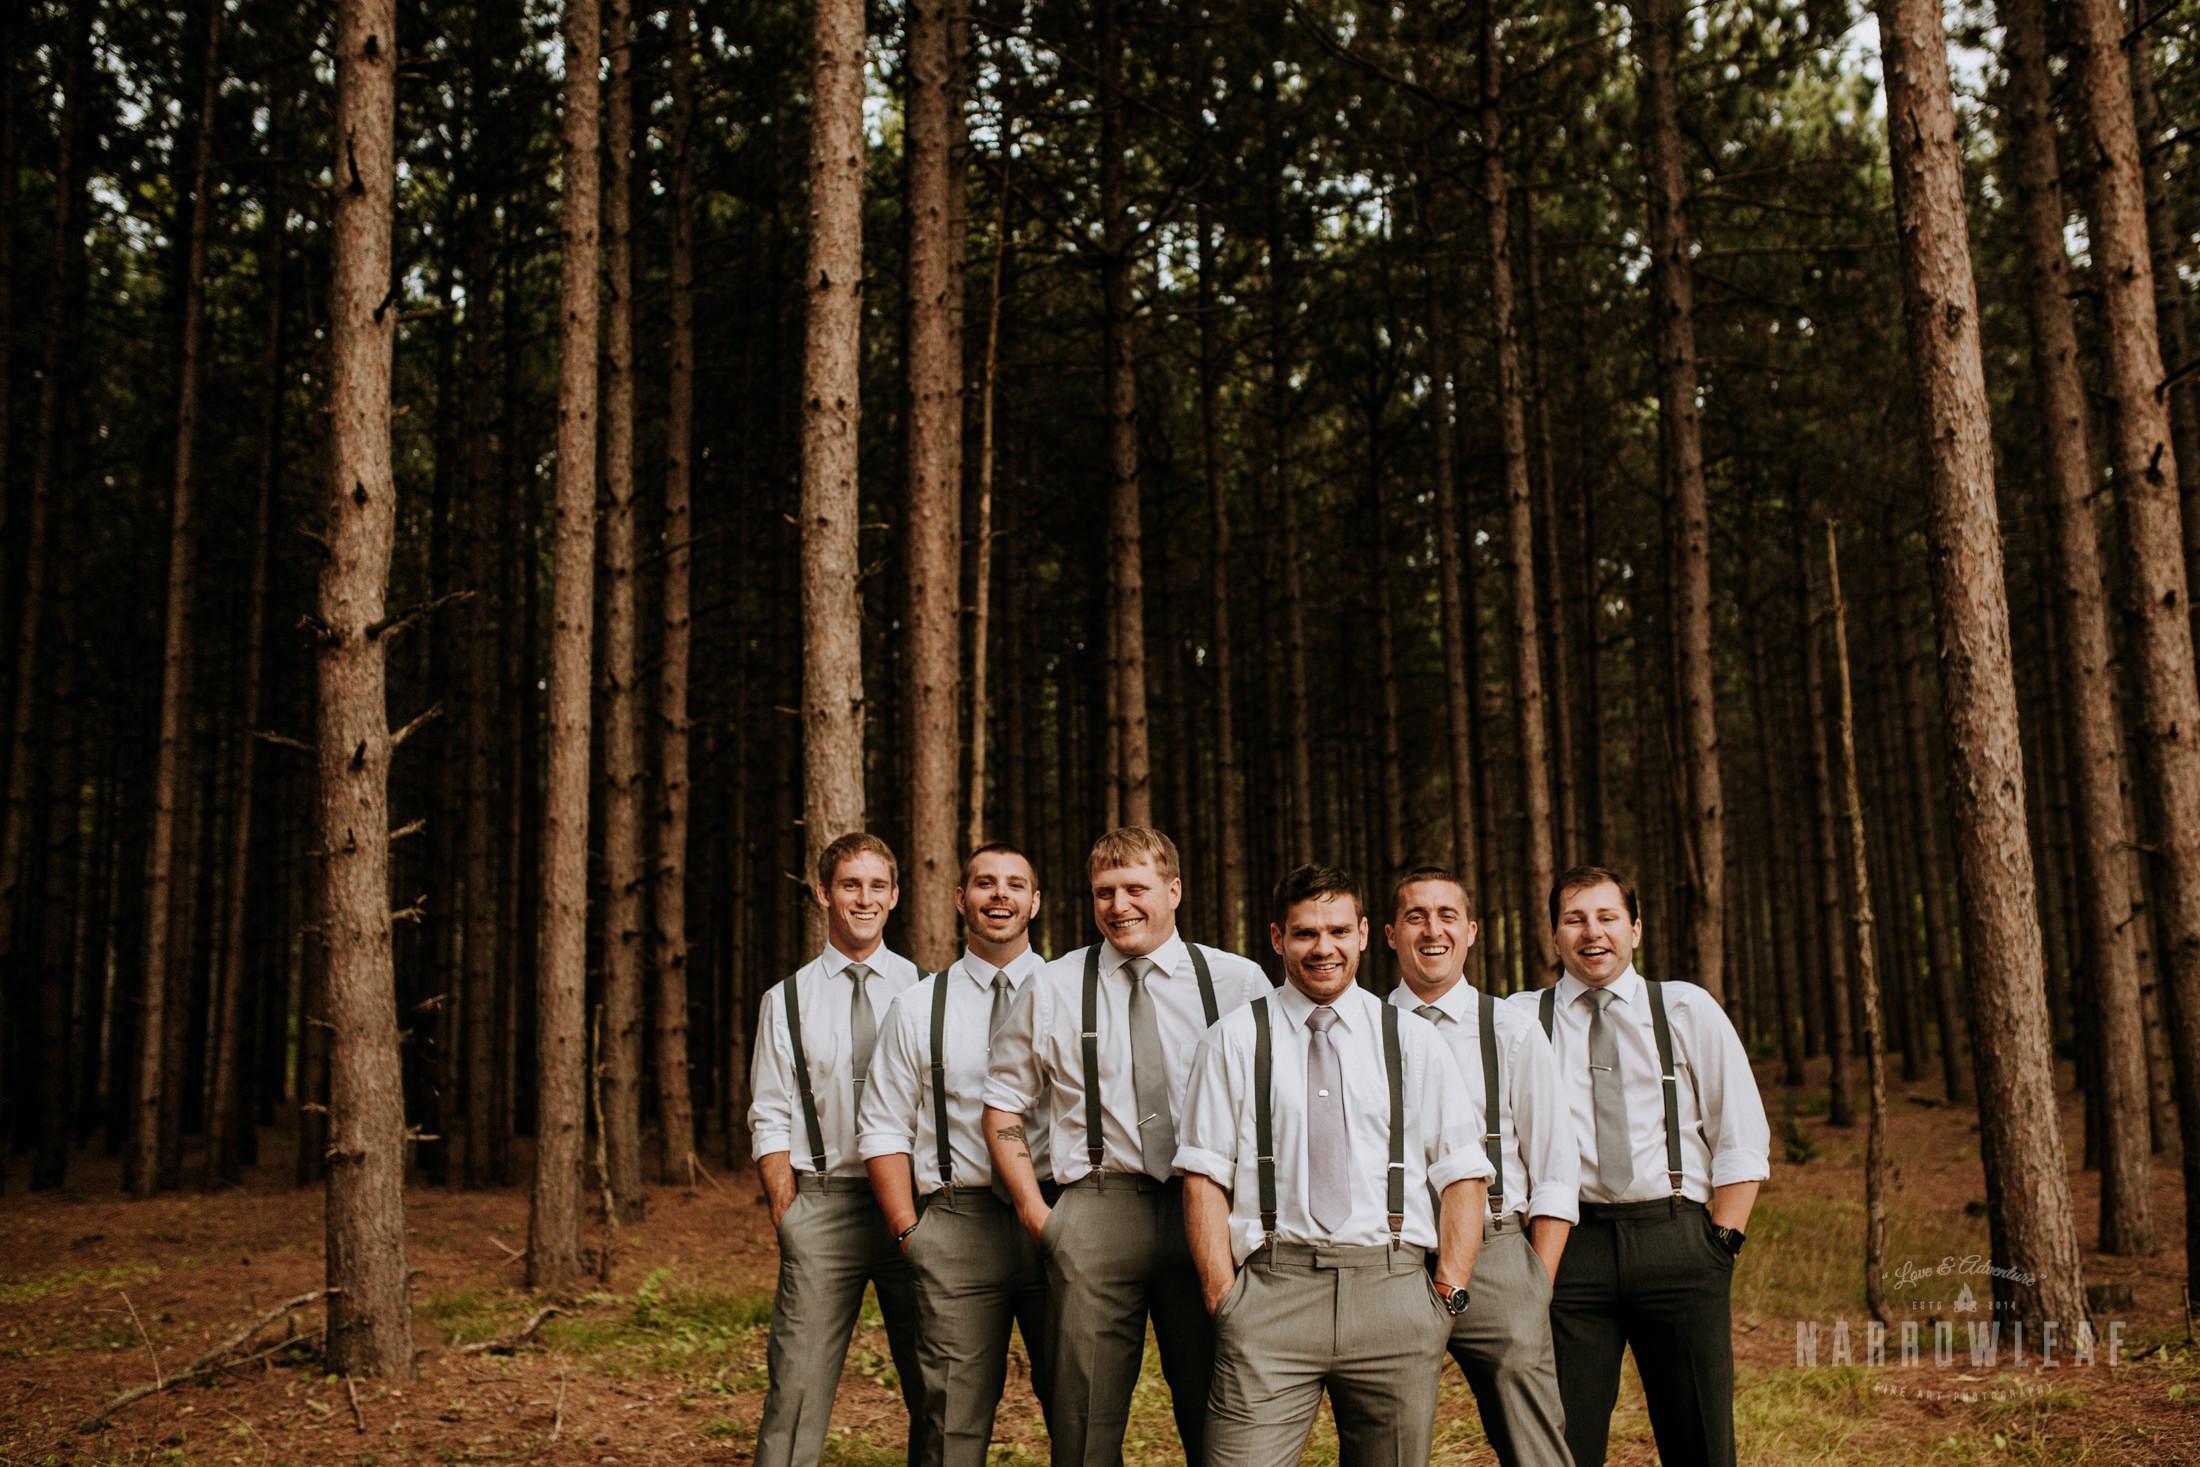 door-county-wedding-photographer-in-the-woods-Narrowleaf_Love_and_Adventure_Photography-9364.jpg